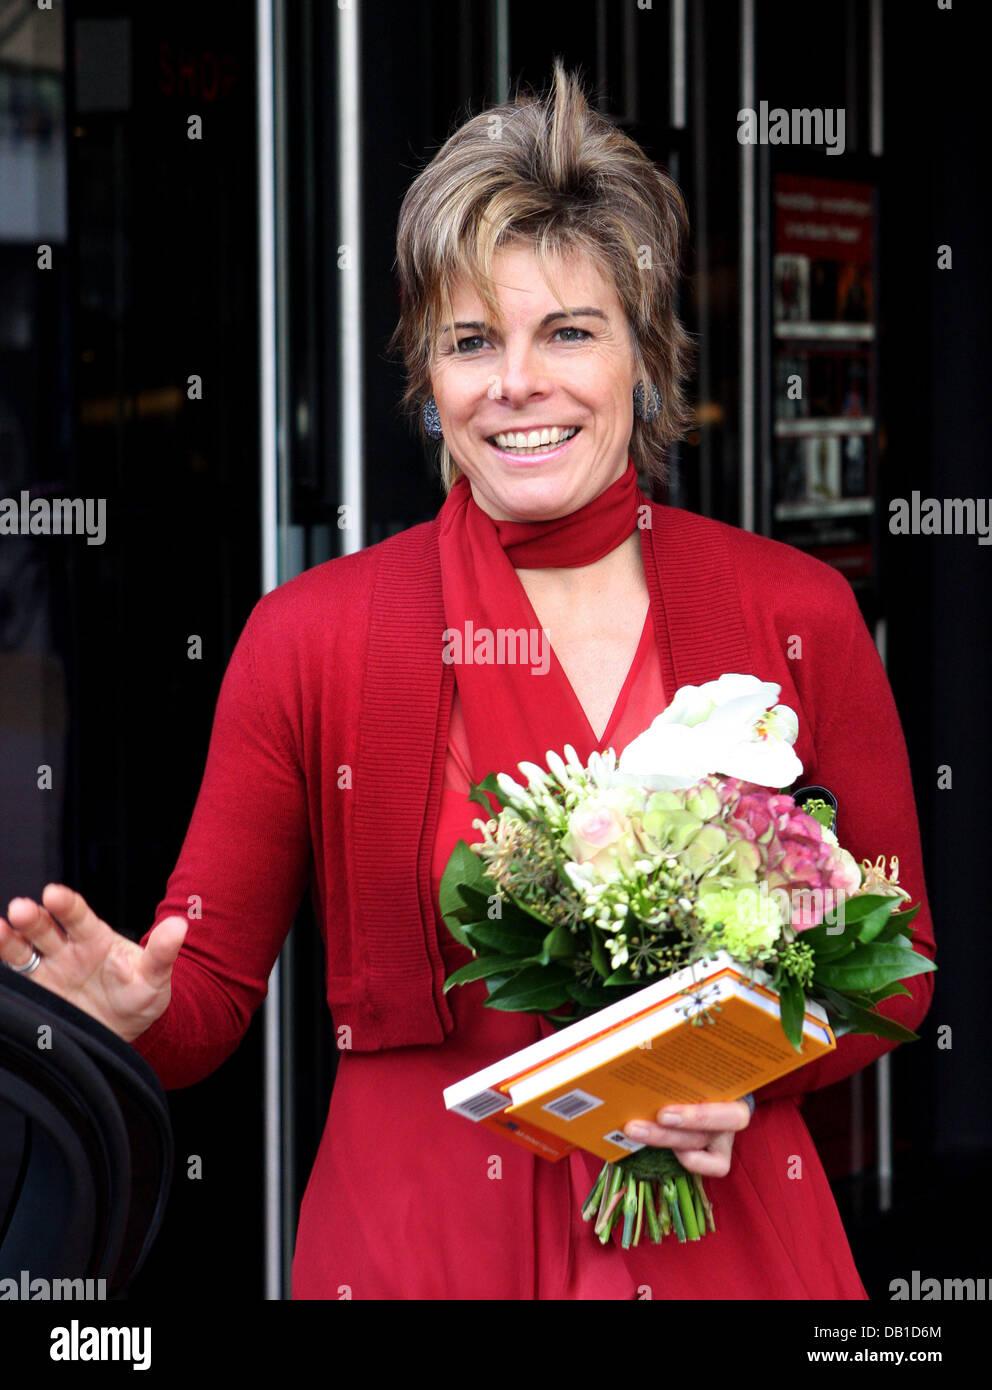 Princess Laurentien of the Netherlands attends the 75th annivarsary of the association 'Taal Genootschap' in Utrecht, Stock Photo